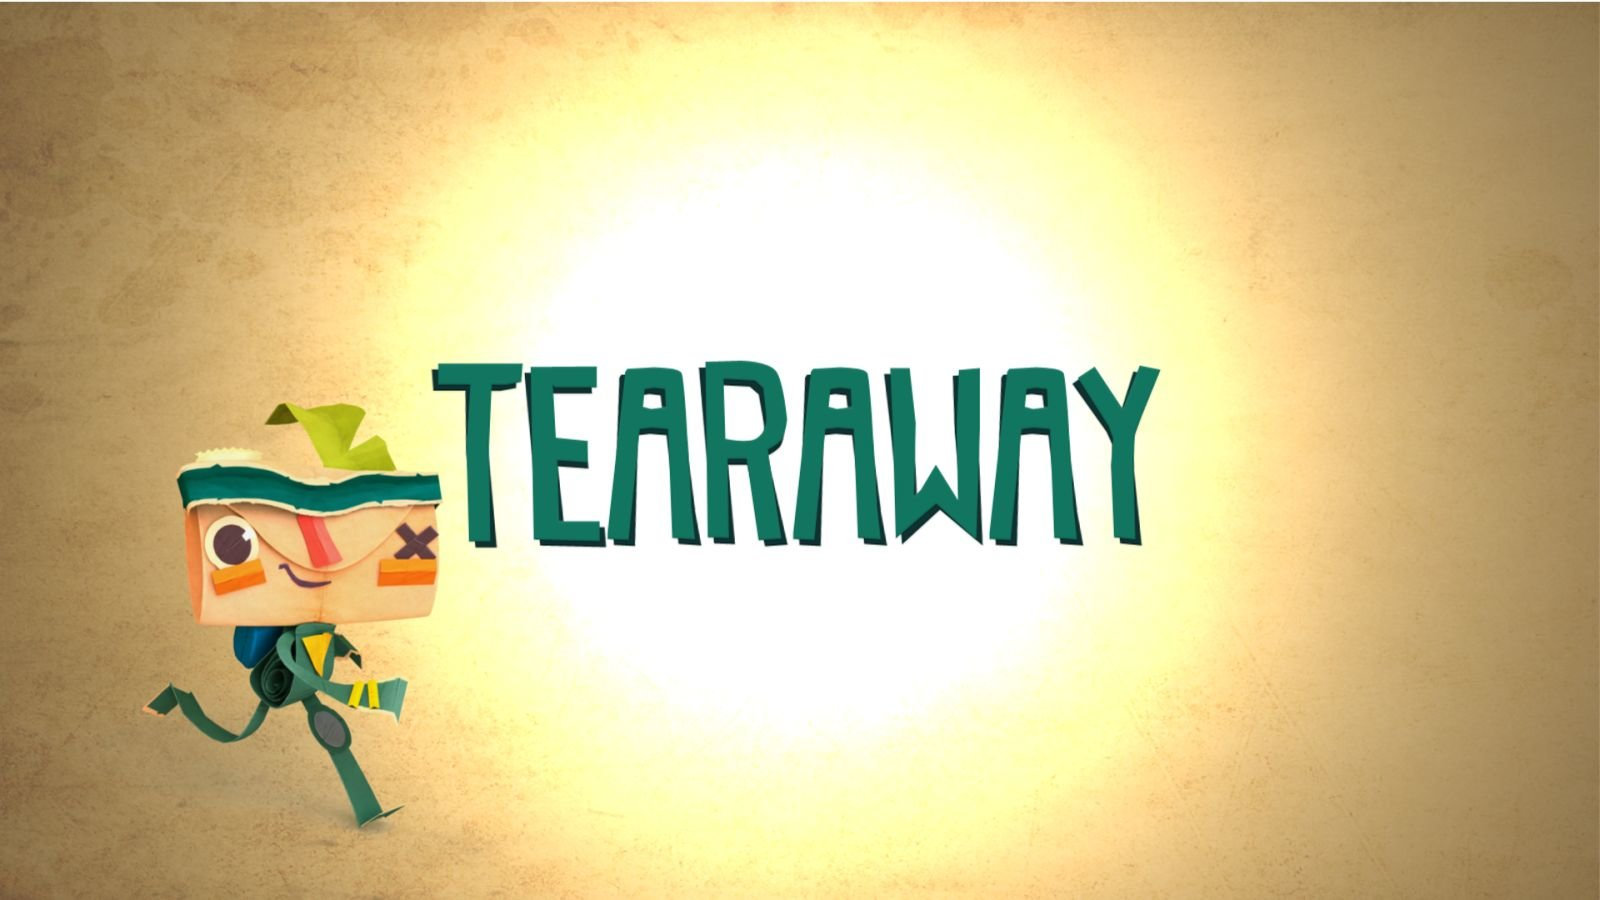 Tearaway-Delayed-to-November-22-Says-Media-Molecule-371817-2